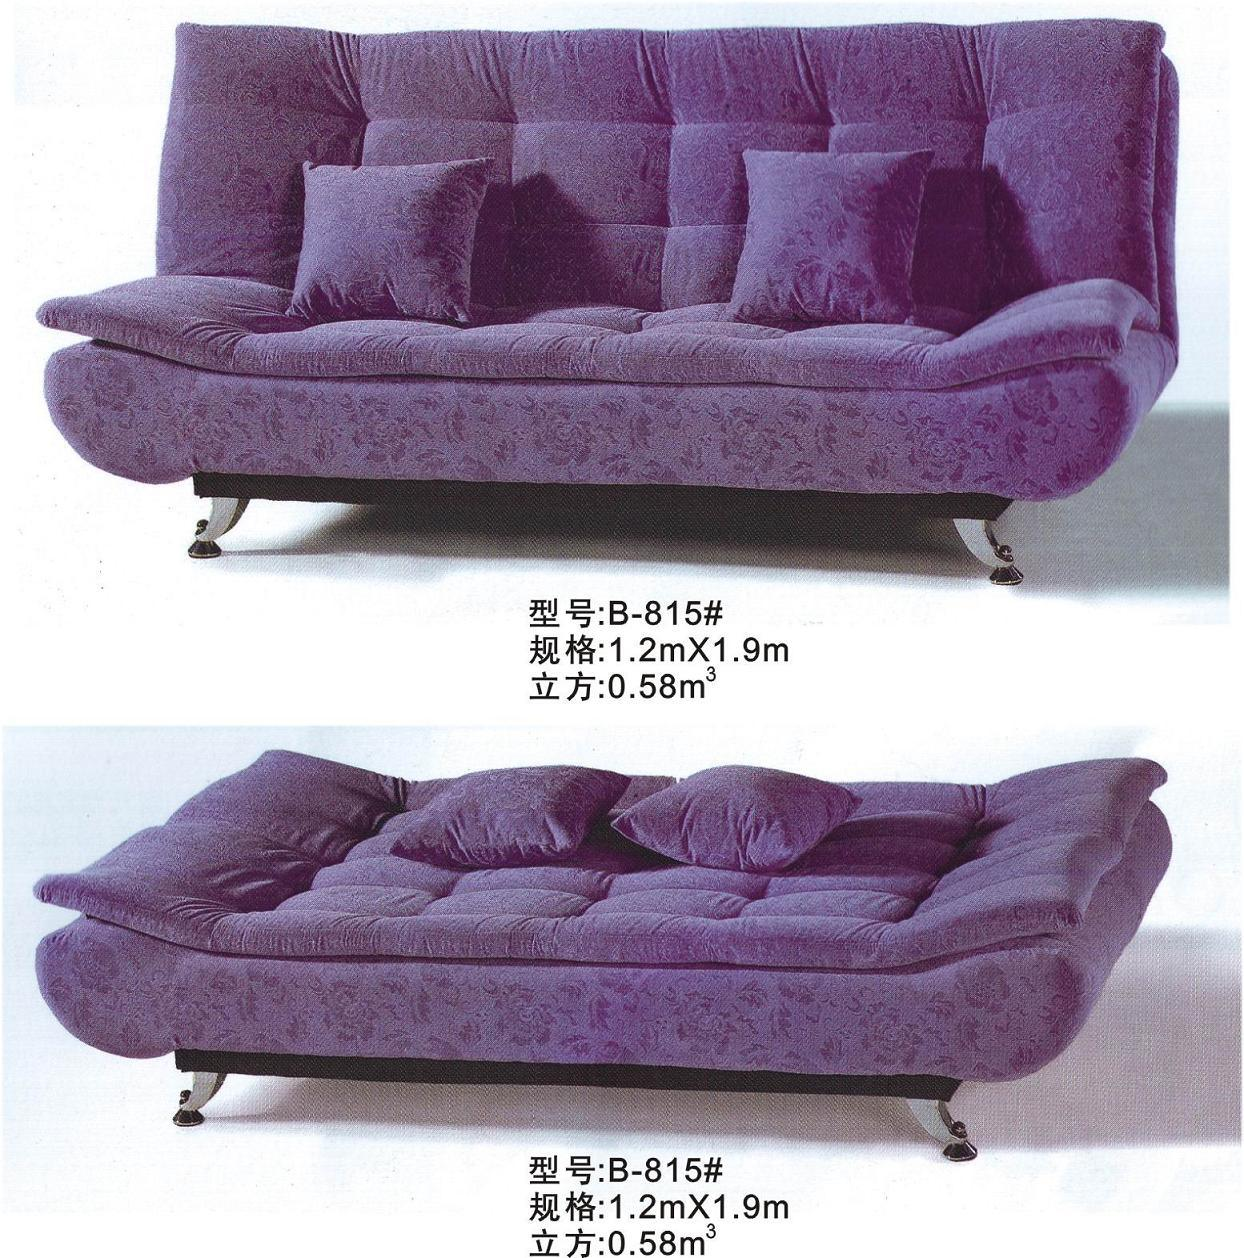 china multifunction sofa bed b 815 china sofa bed sofa. Black Bedroom Furniture Sets. Home Design Ideas